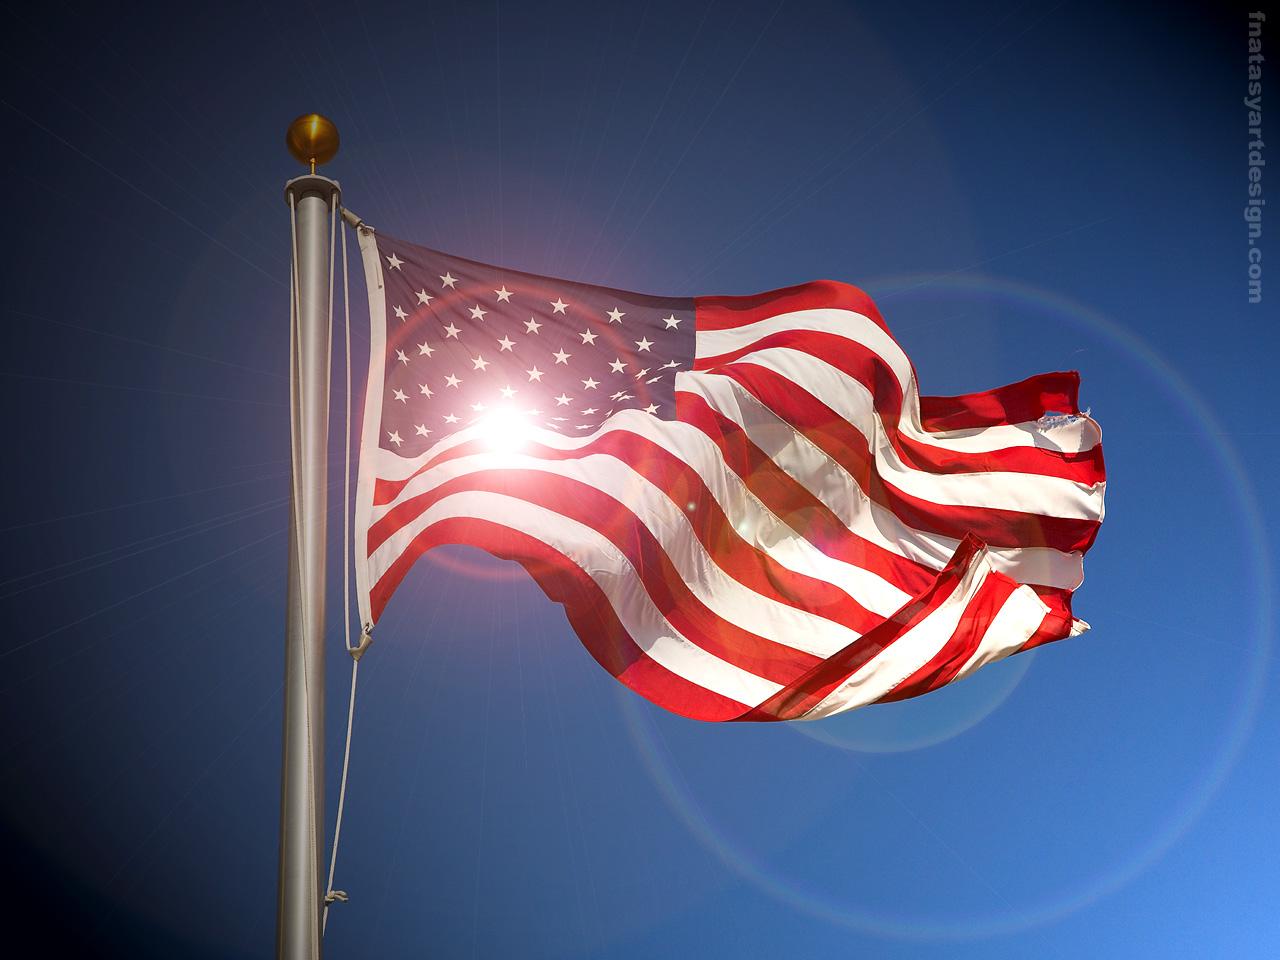 American flag desktop sunrise 1280 x 960pix wallpaper Abstract Photo 1280x960